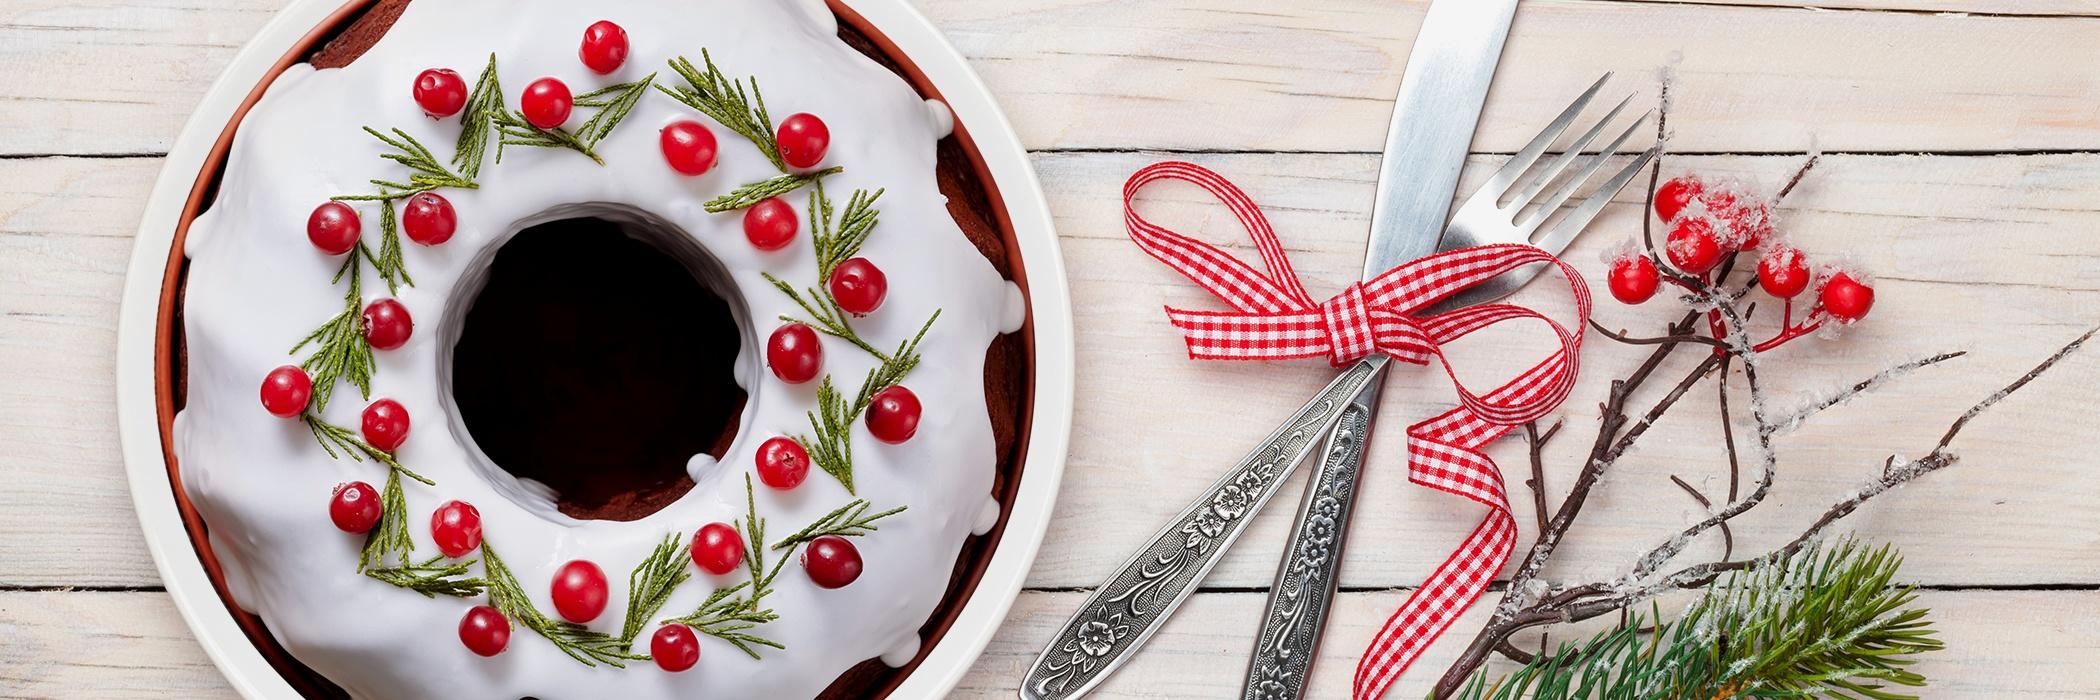 Torta al cramberry